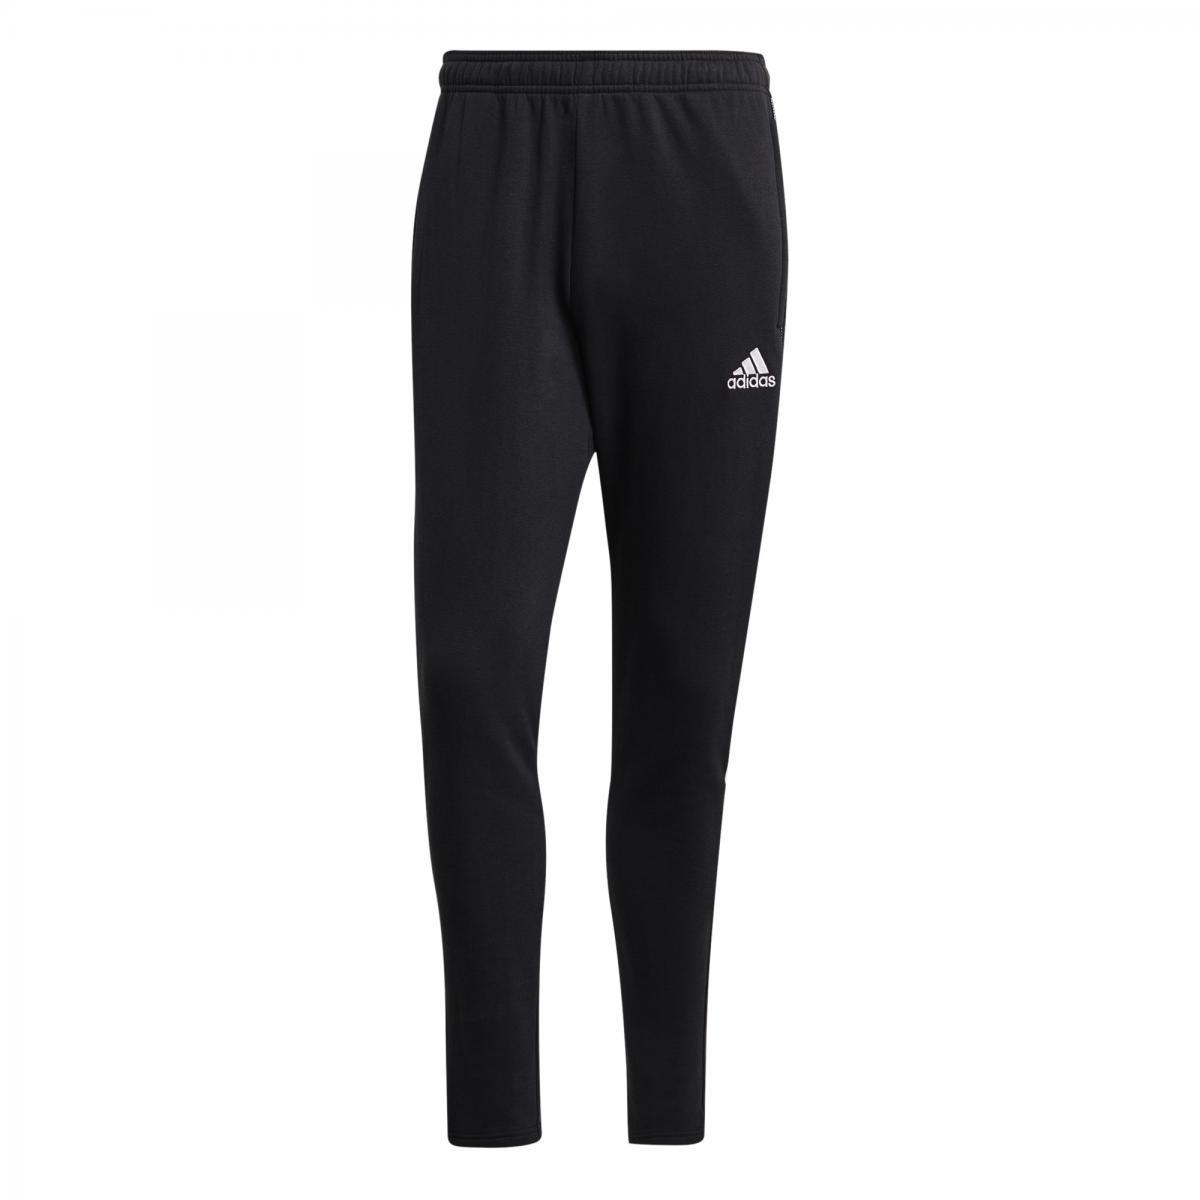 Adidas  Tiro21 Sw Pnt, joggebukse